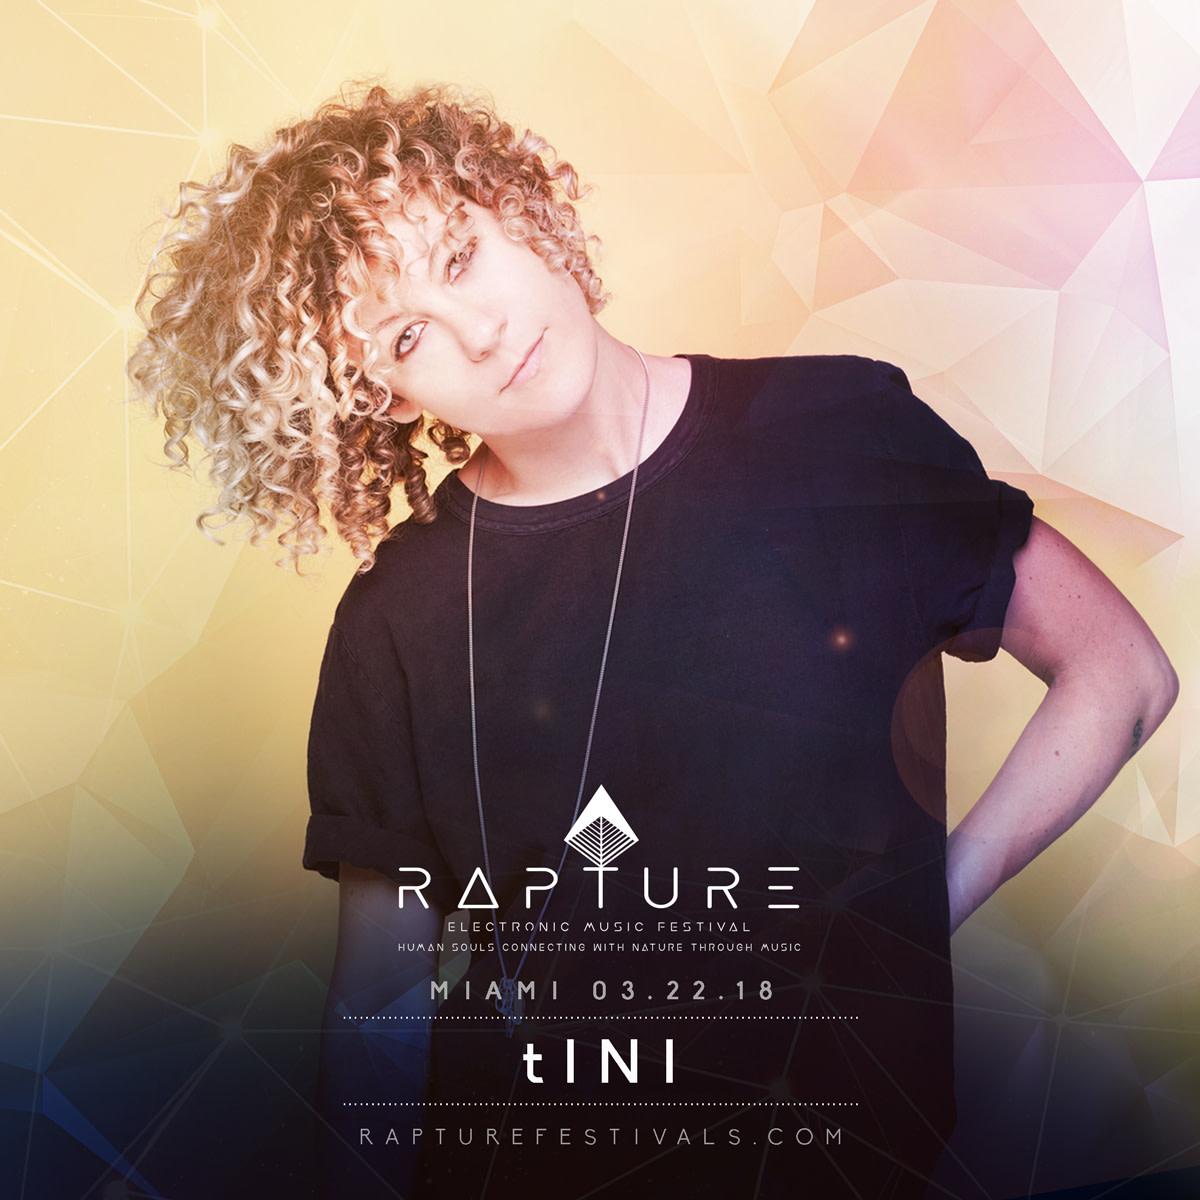 tINI Rapture Festival 2018